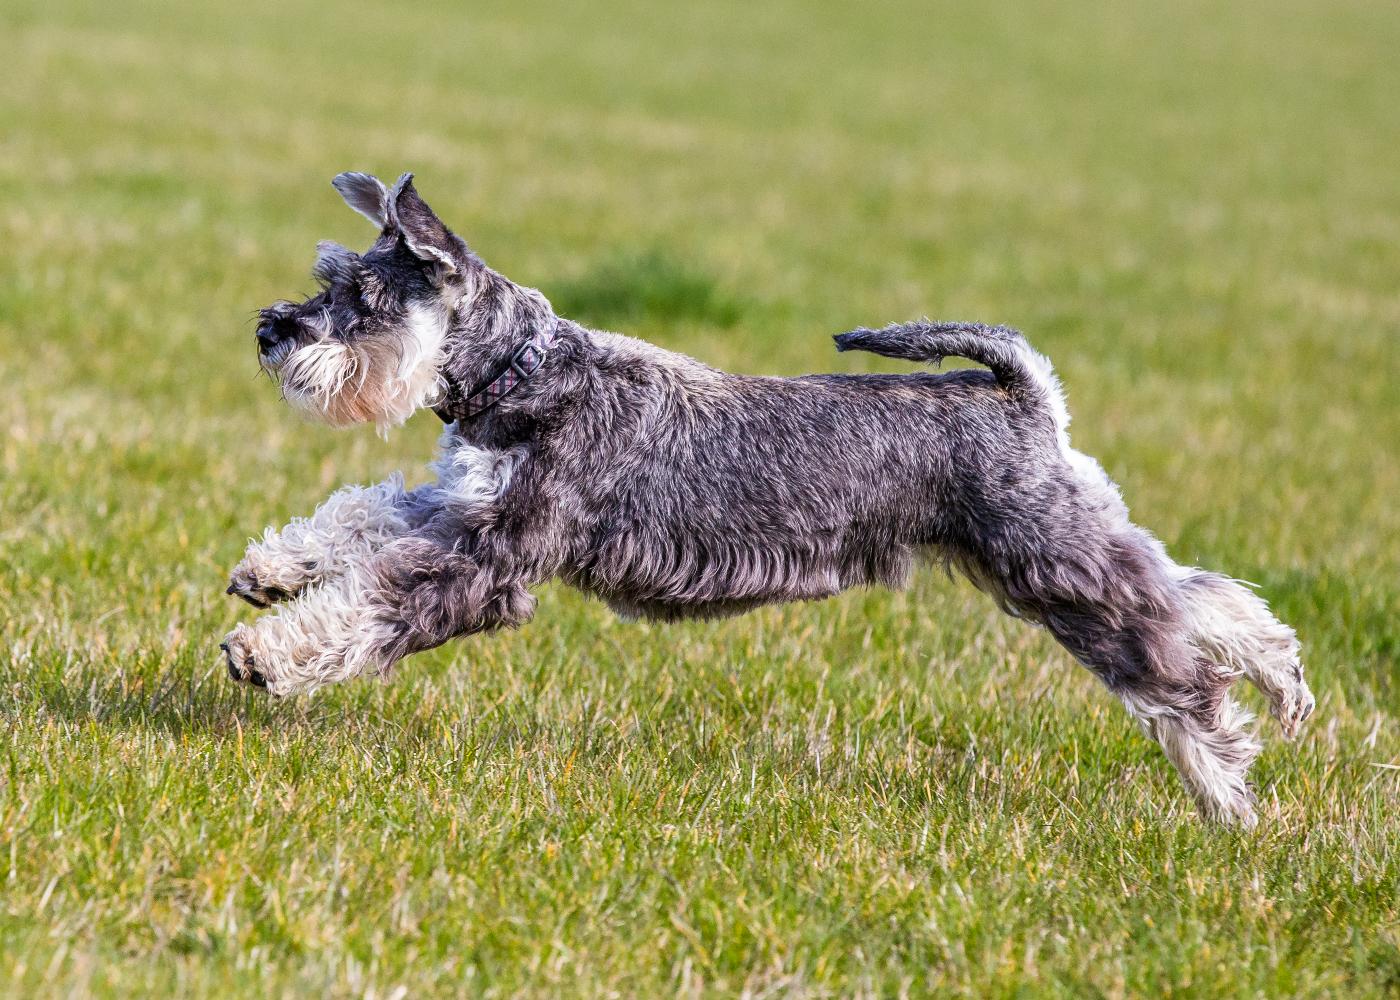 schnauzer a correr no jardim